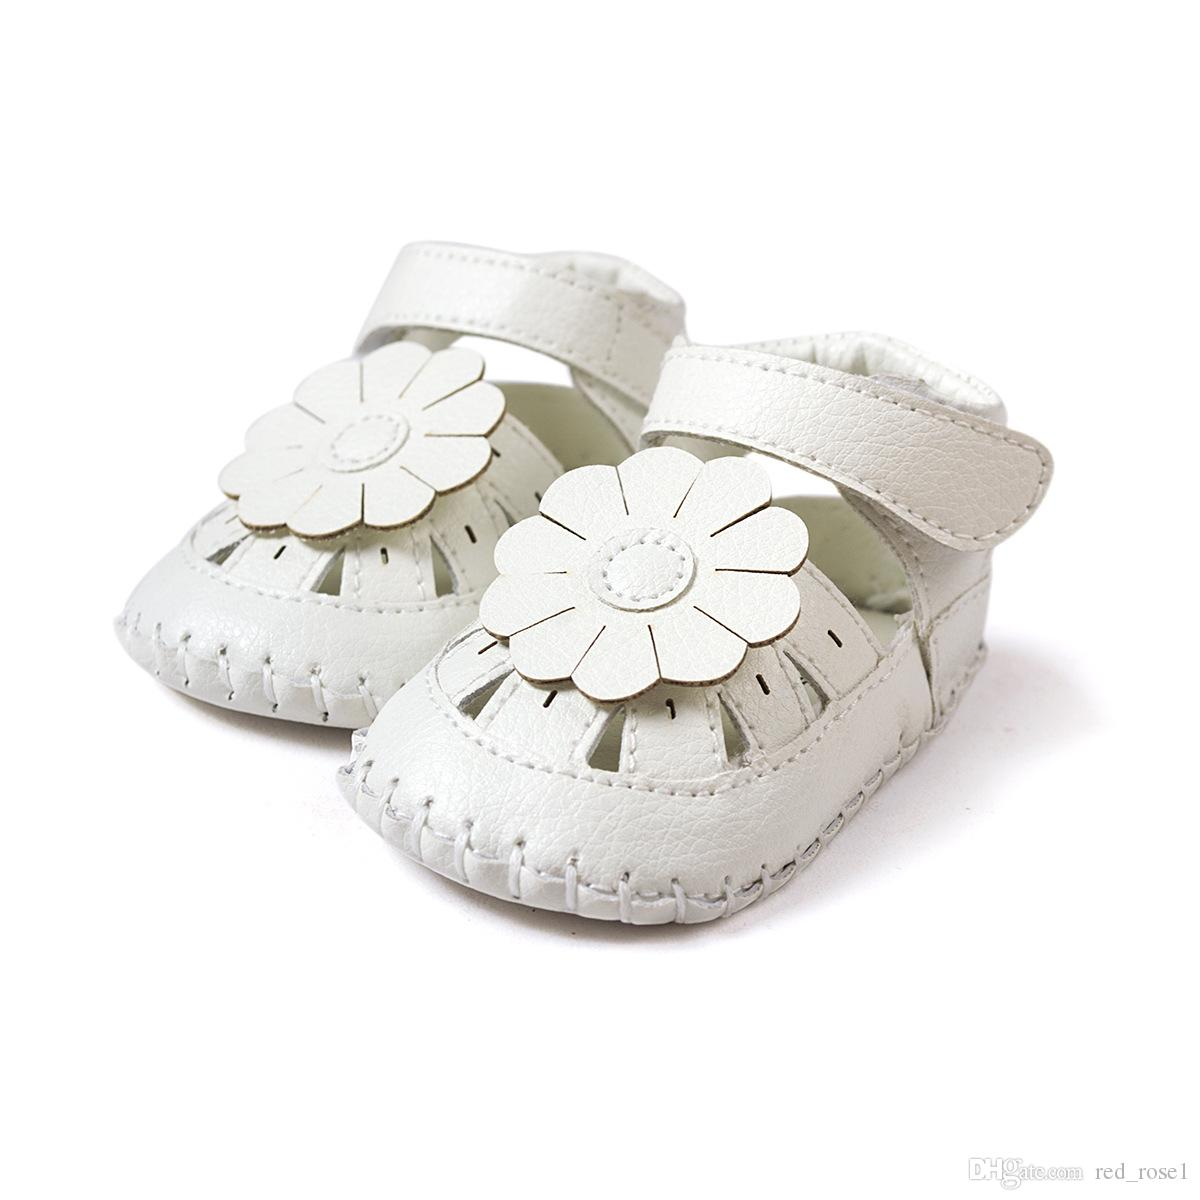 Baby First Walkers Nueva moda Verano Bebé Gilrs Sandalias Zuecos Blanco Plano Con Suave Infant Toddler Kid Girls Sandalias zapatos de bebé